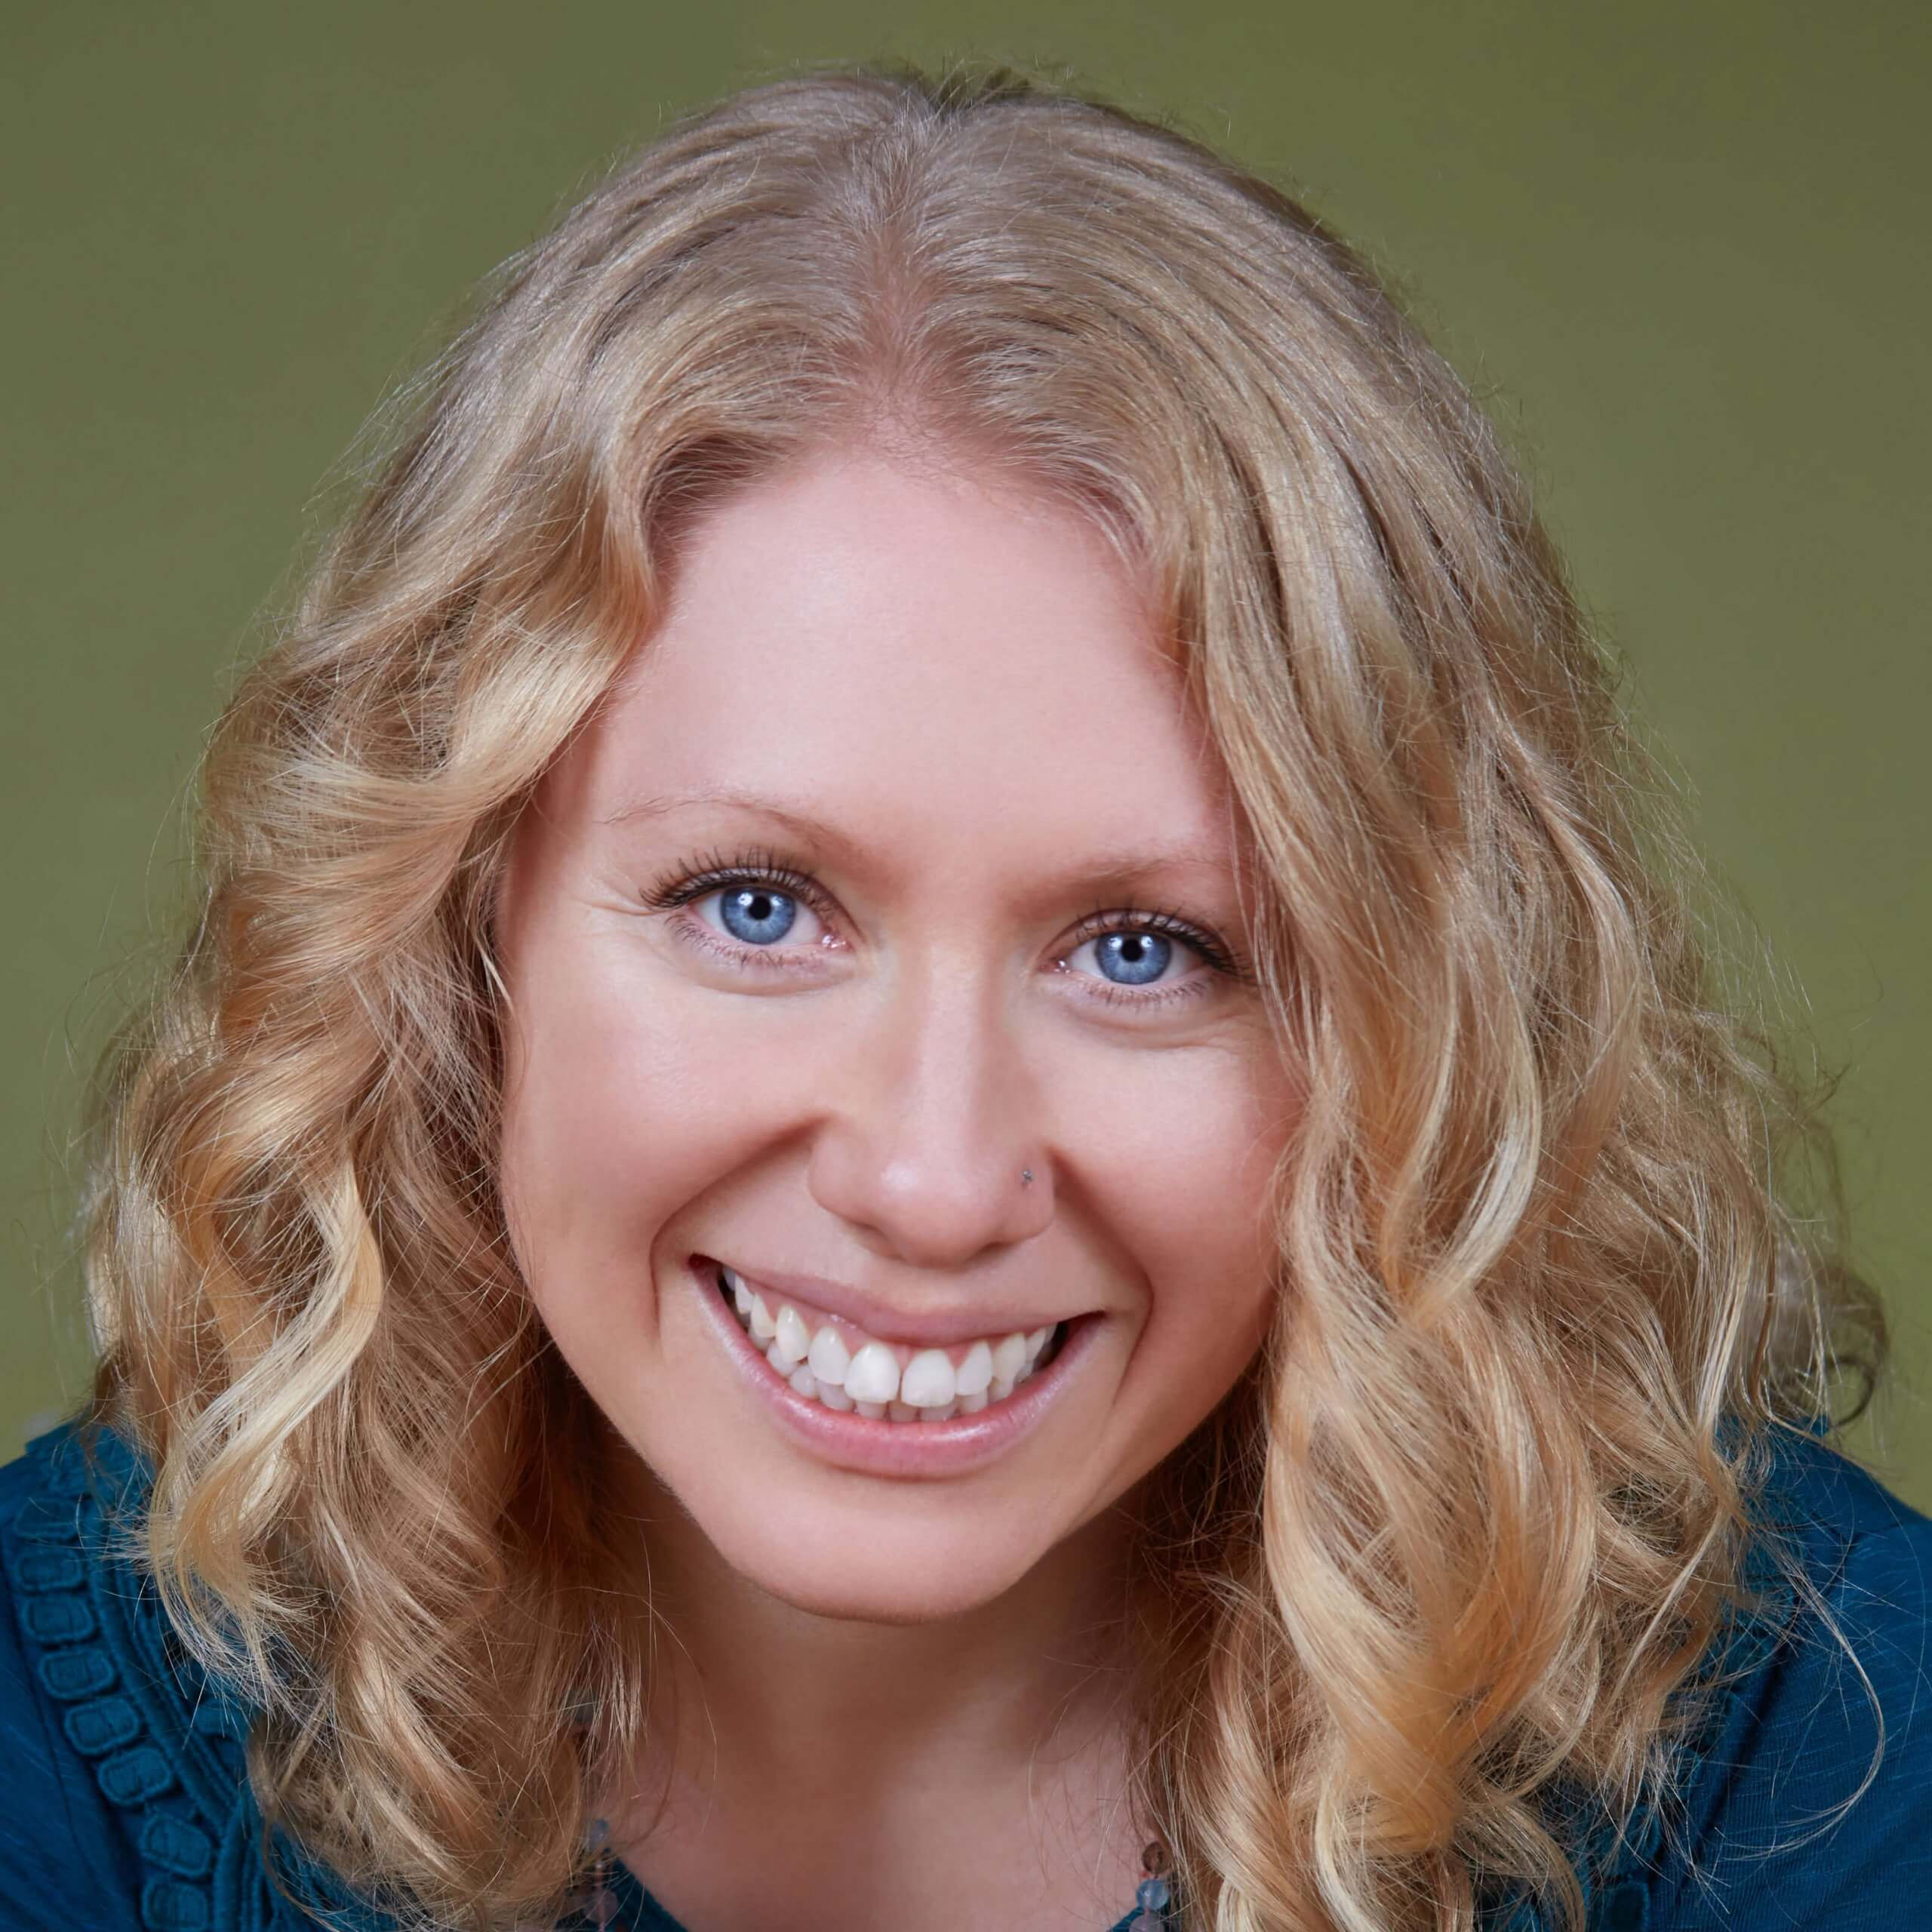 Picture of Sarah Wechsberg